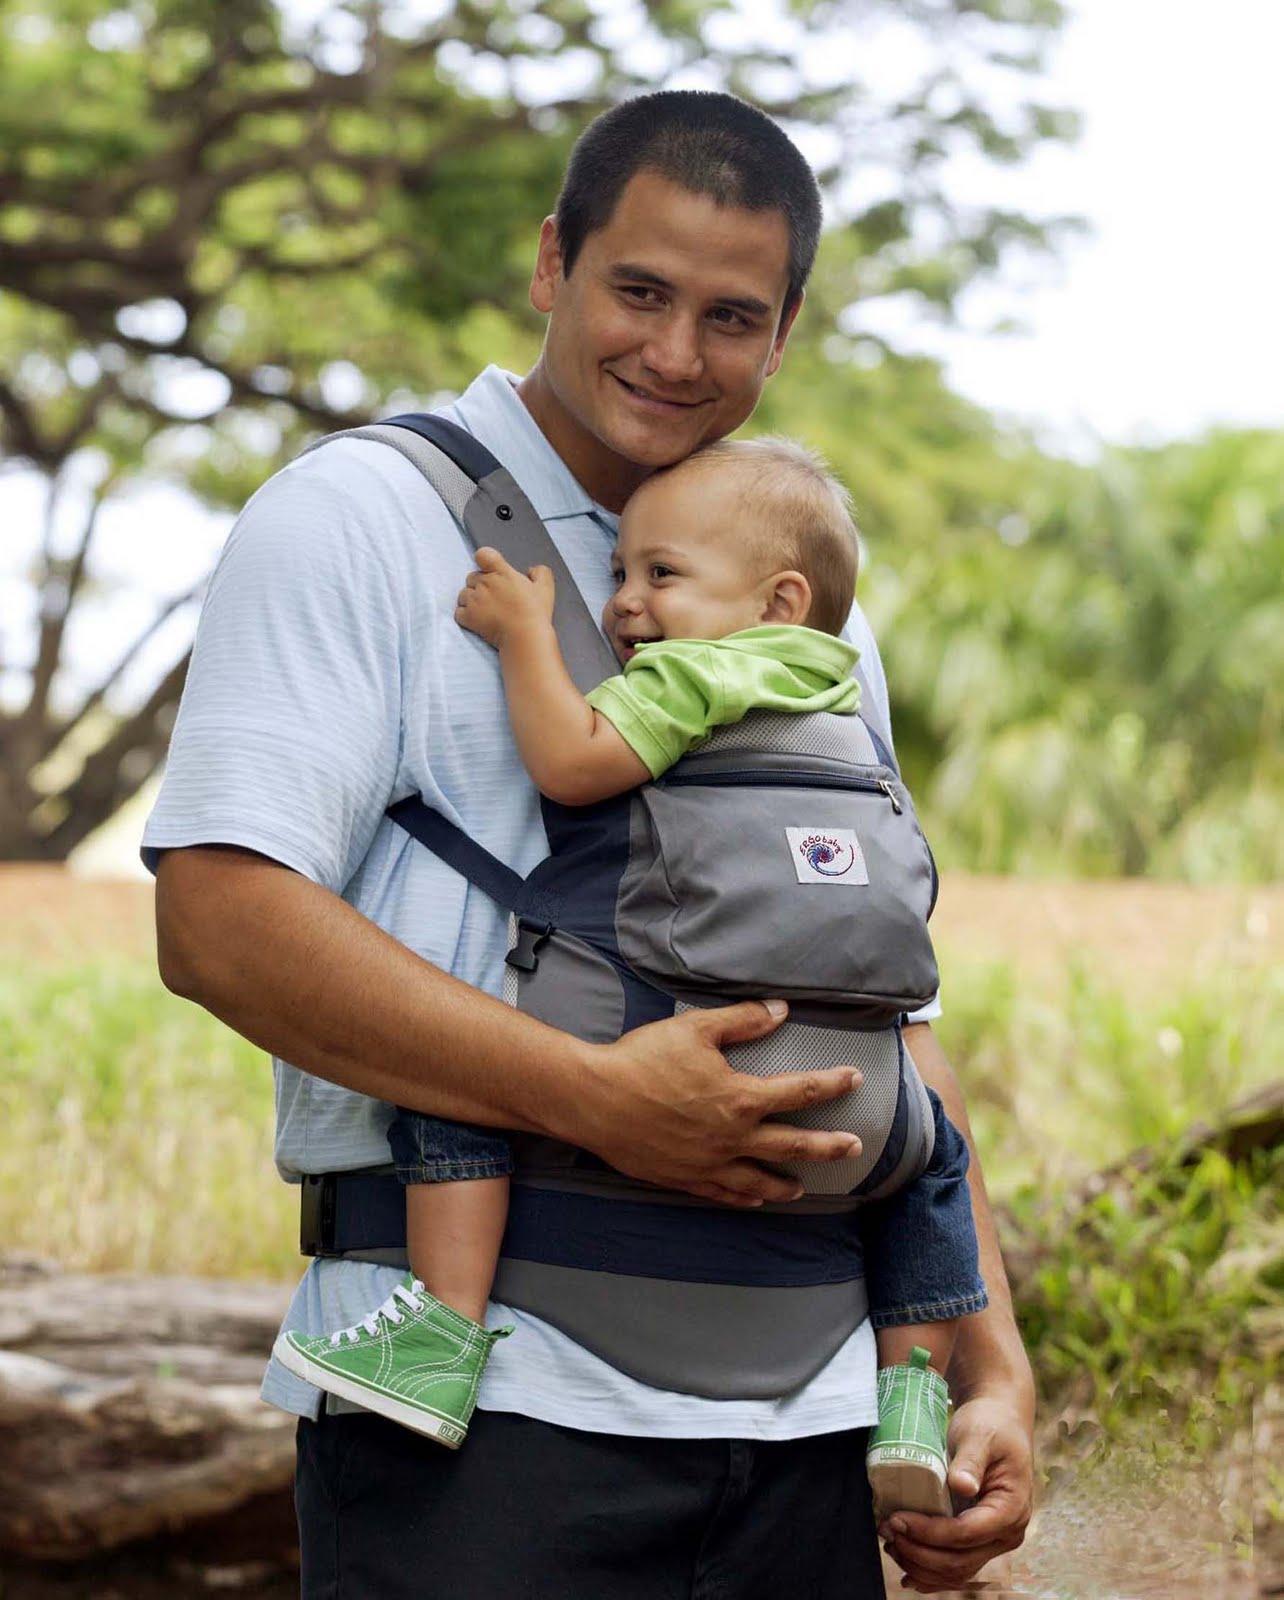 Belly Beyond Blog Real Men Wear Their Babies